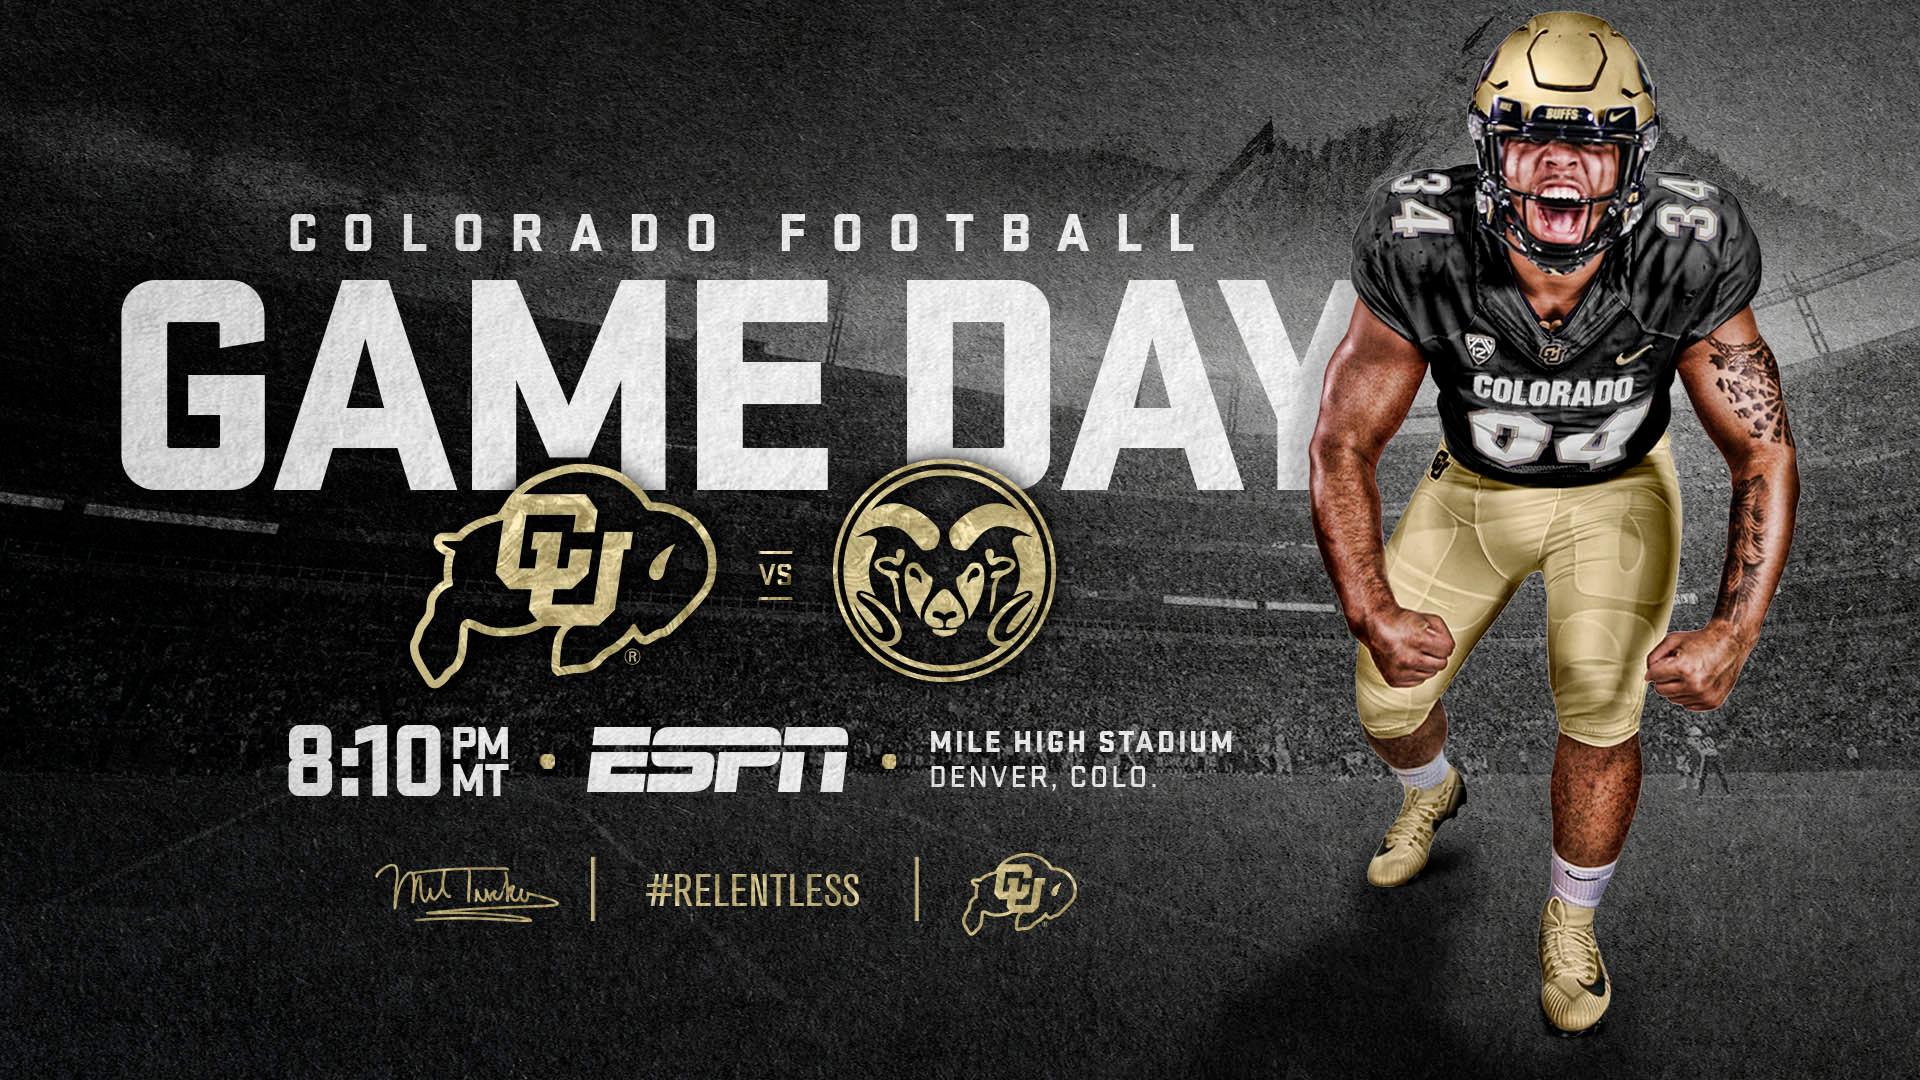 Gameday - Colorado State 02.jpg